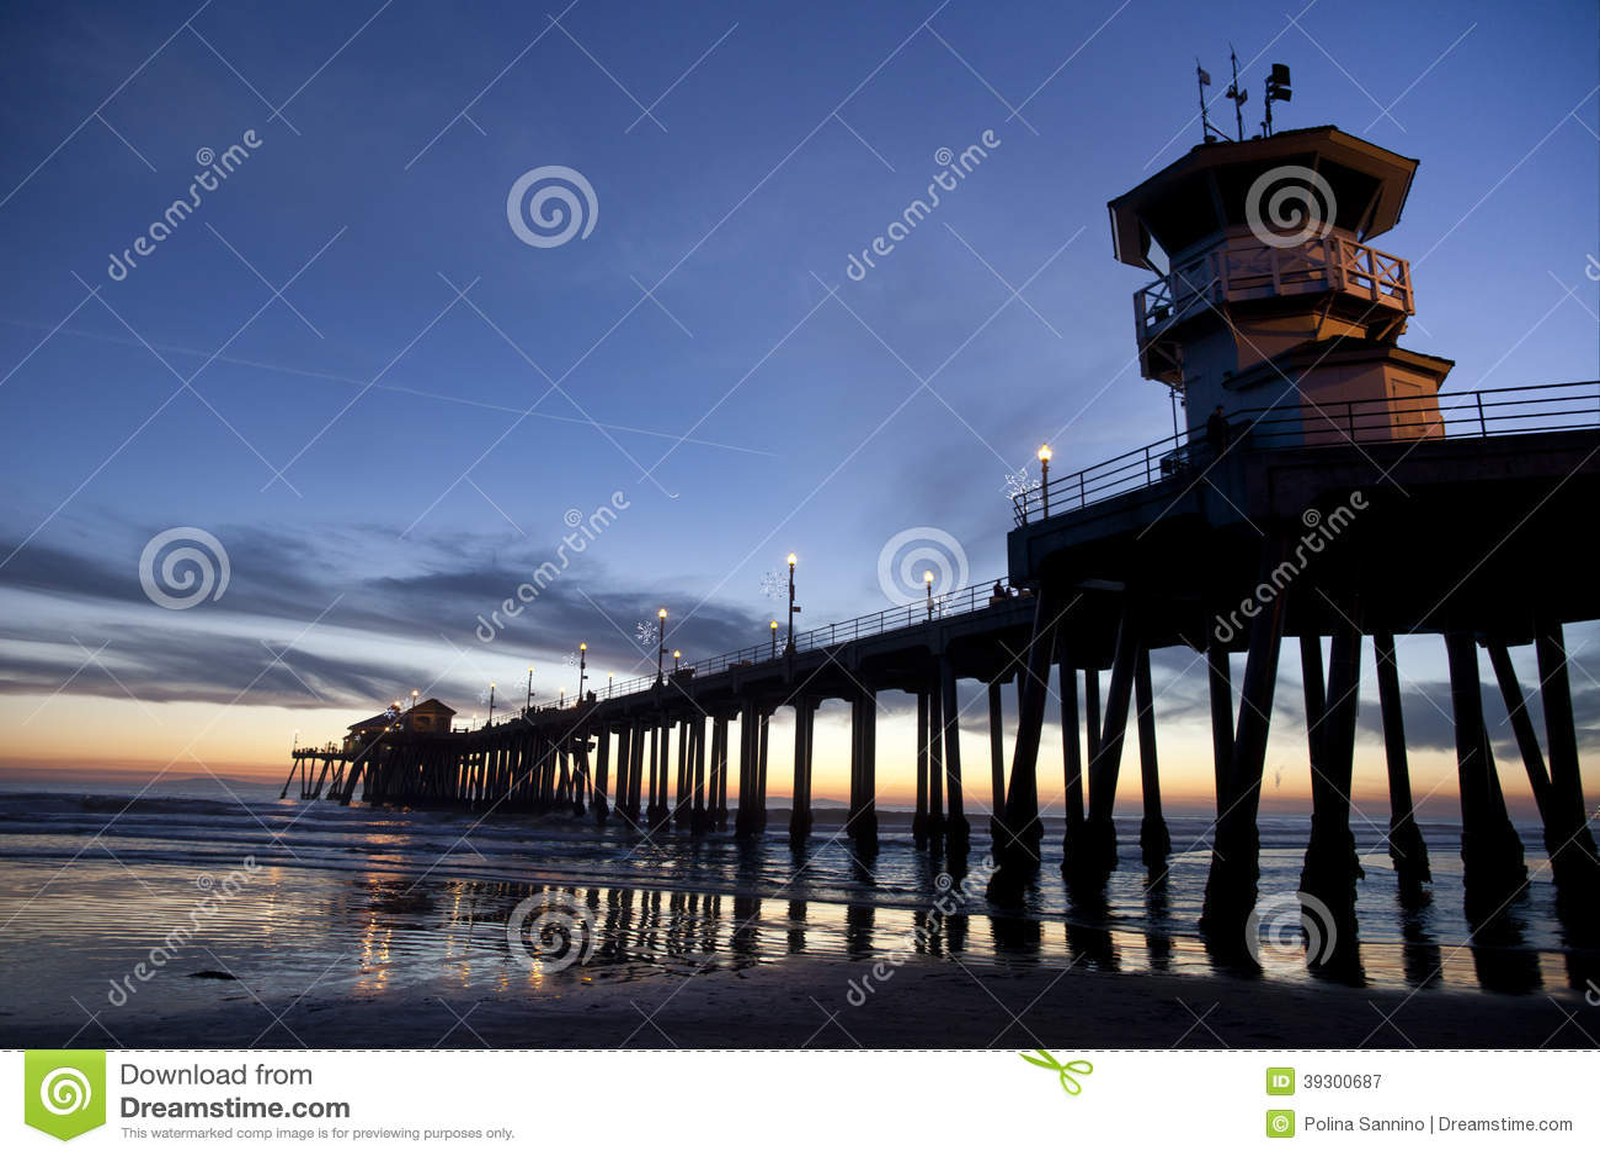 Huntington Beach Pier HDR stock image. Image of ocean